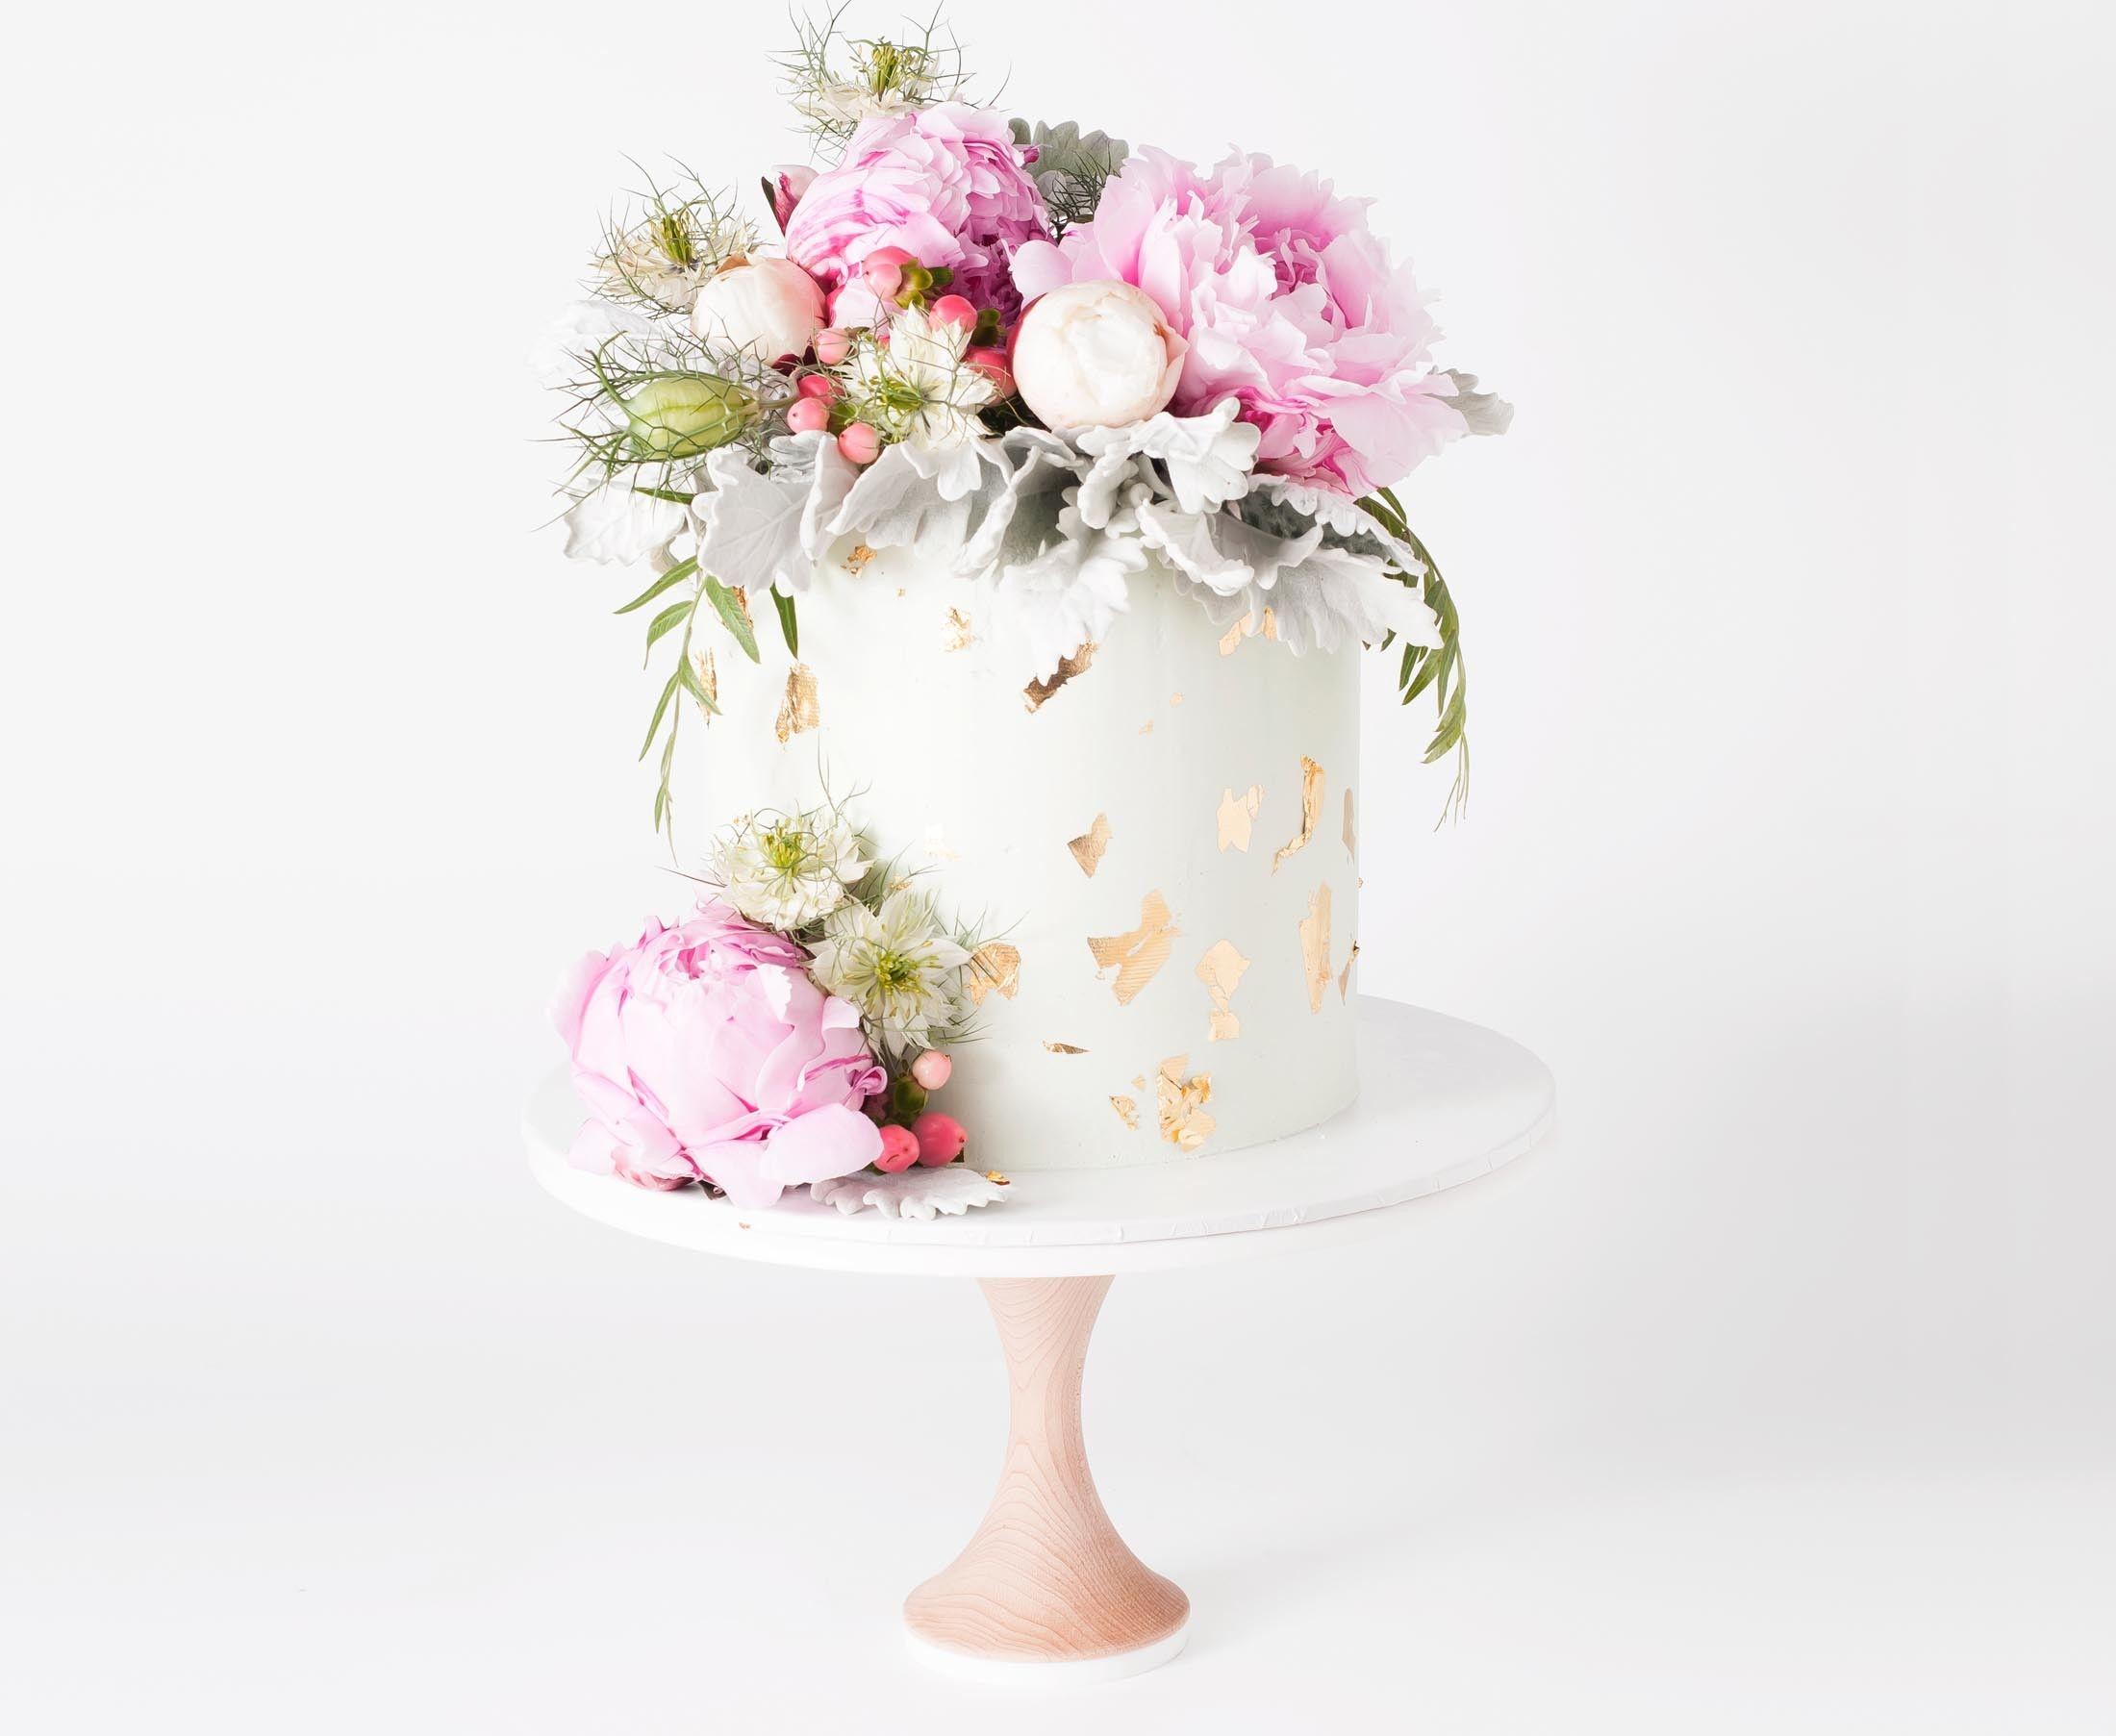 Buttercream cake with flowers in 2019 Buttercream cake